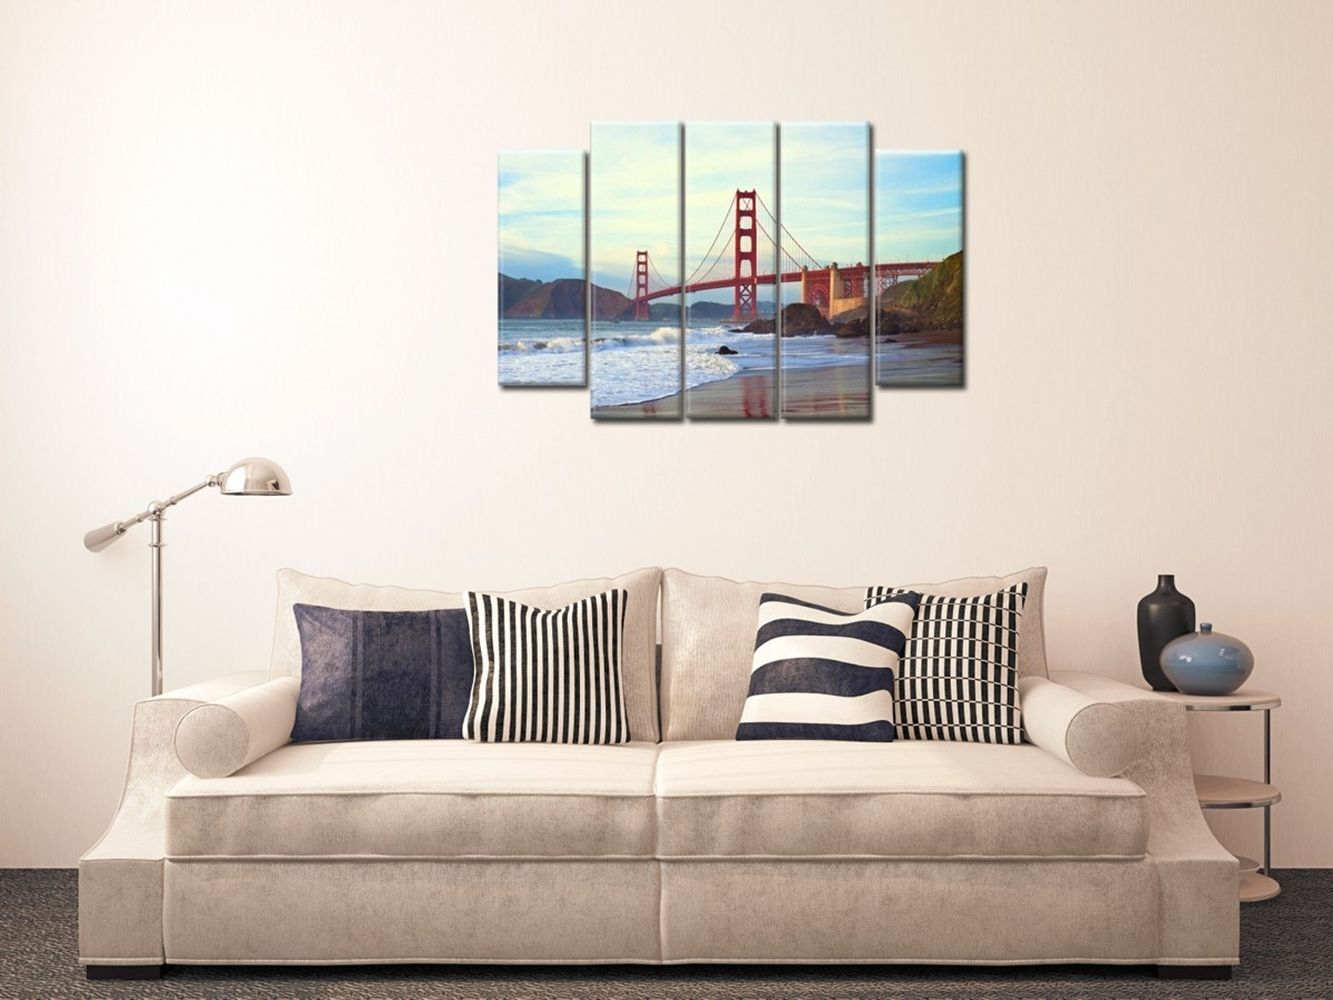 Canvas Print - San Francisco Is Around The Corner Cm. 150x100 (5 Panels)